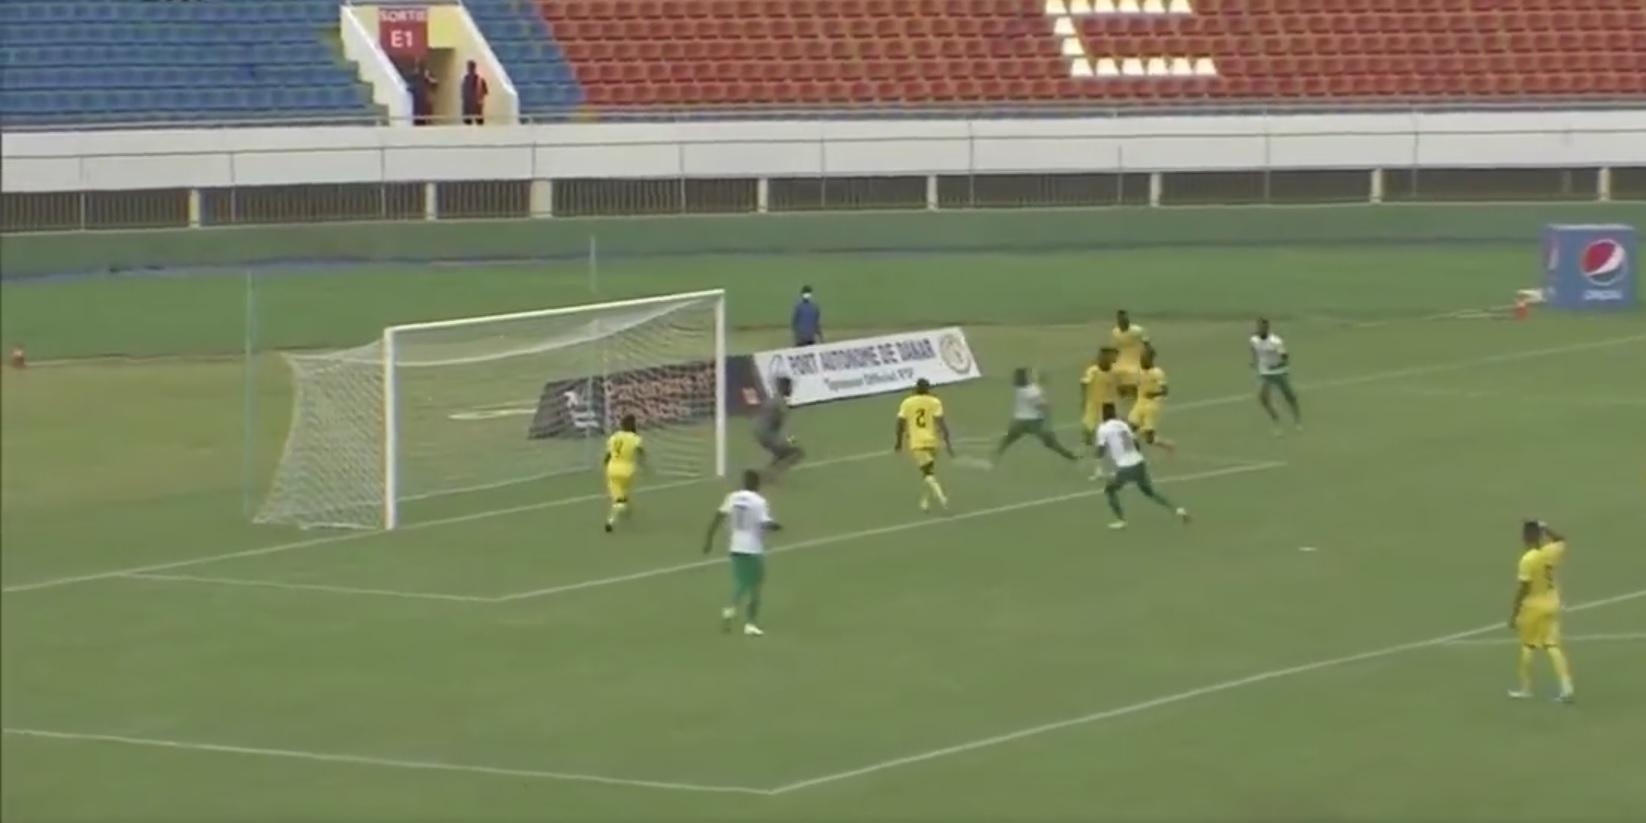 (Video) Liverpool star Sadio Mane on target for Senegal in 2-0 win over Togo